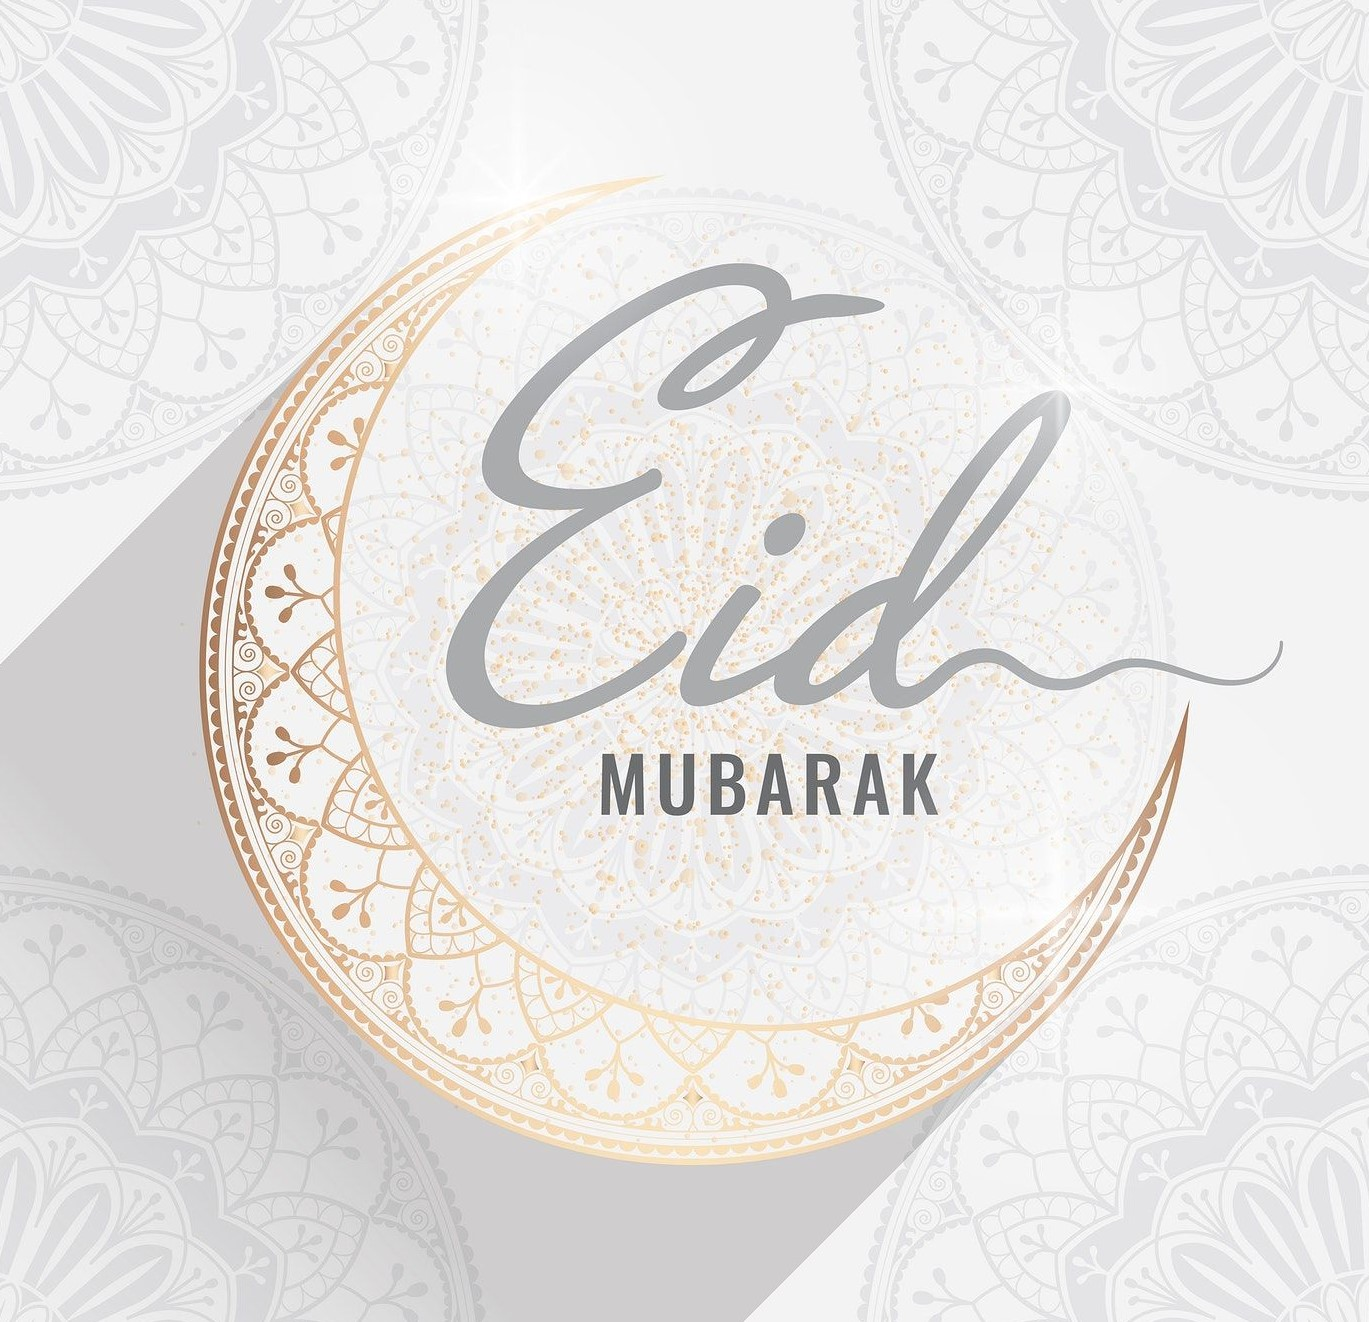 Eid Mubarak Wishes Quotes Status For WhatsApp, Facebook, Instagram, Twitter, Snapchat Stories.